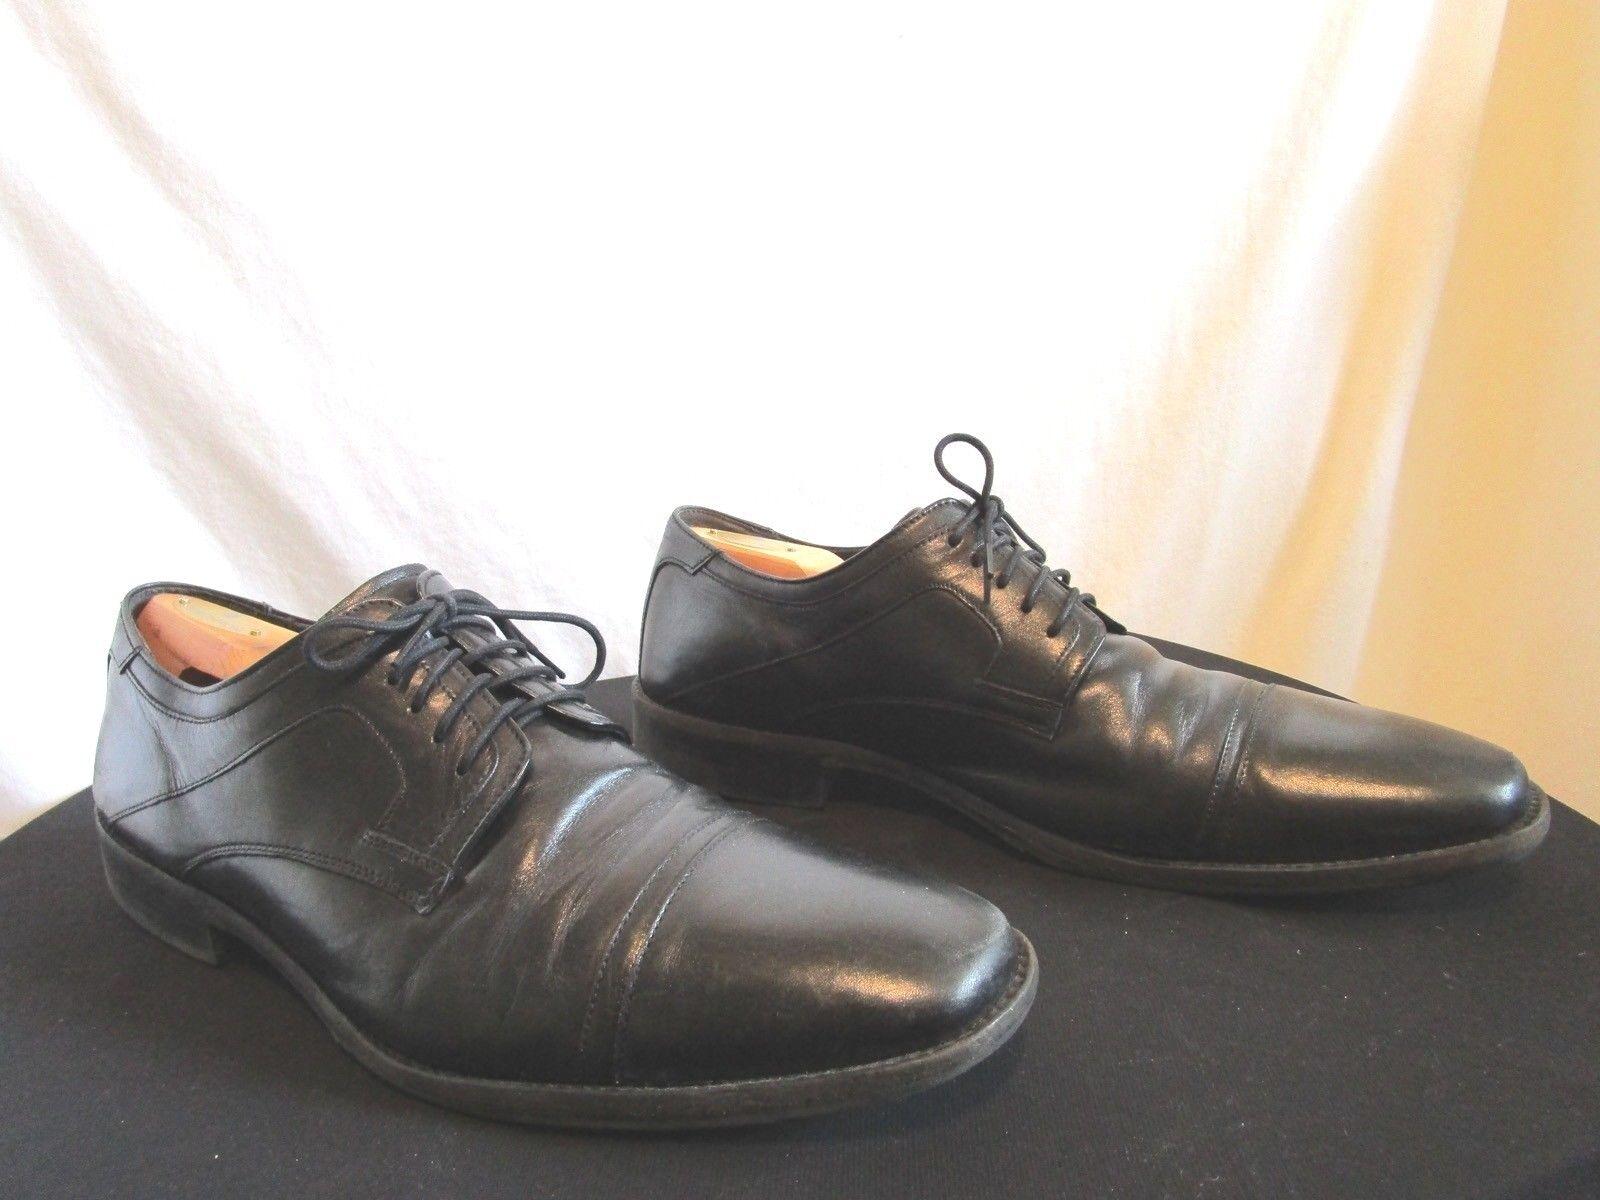 Johnston And Murphy Black Leather Cap Toe Oxford Dress Shoes Men's Sz 13 M